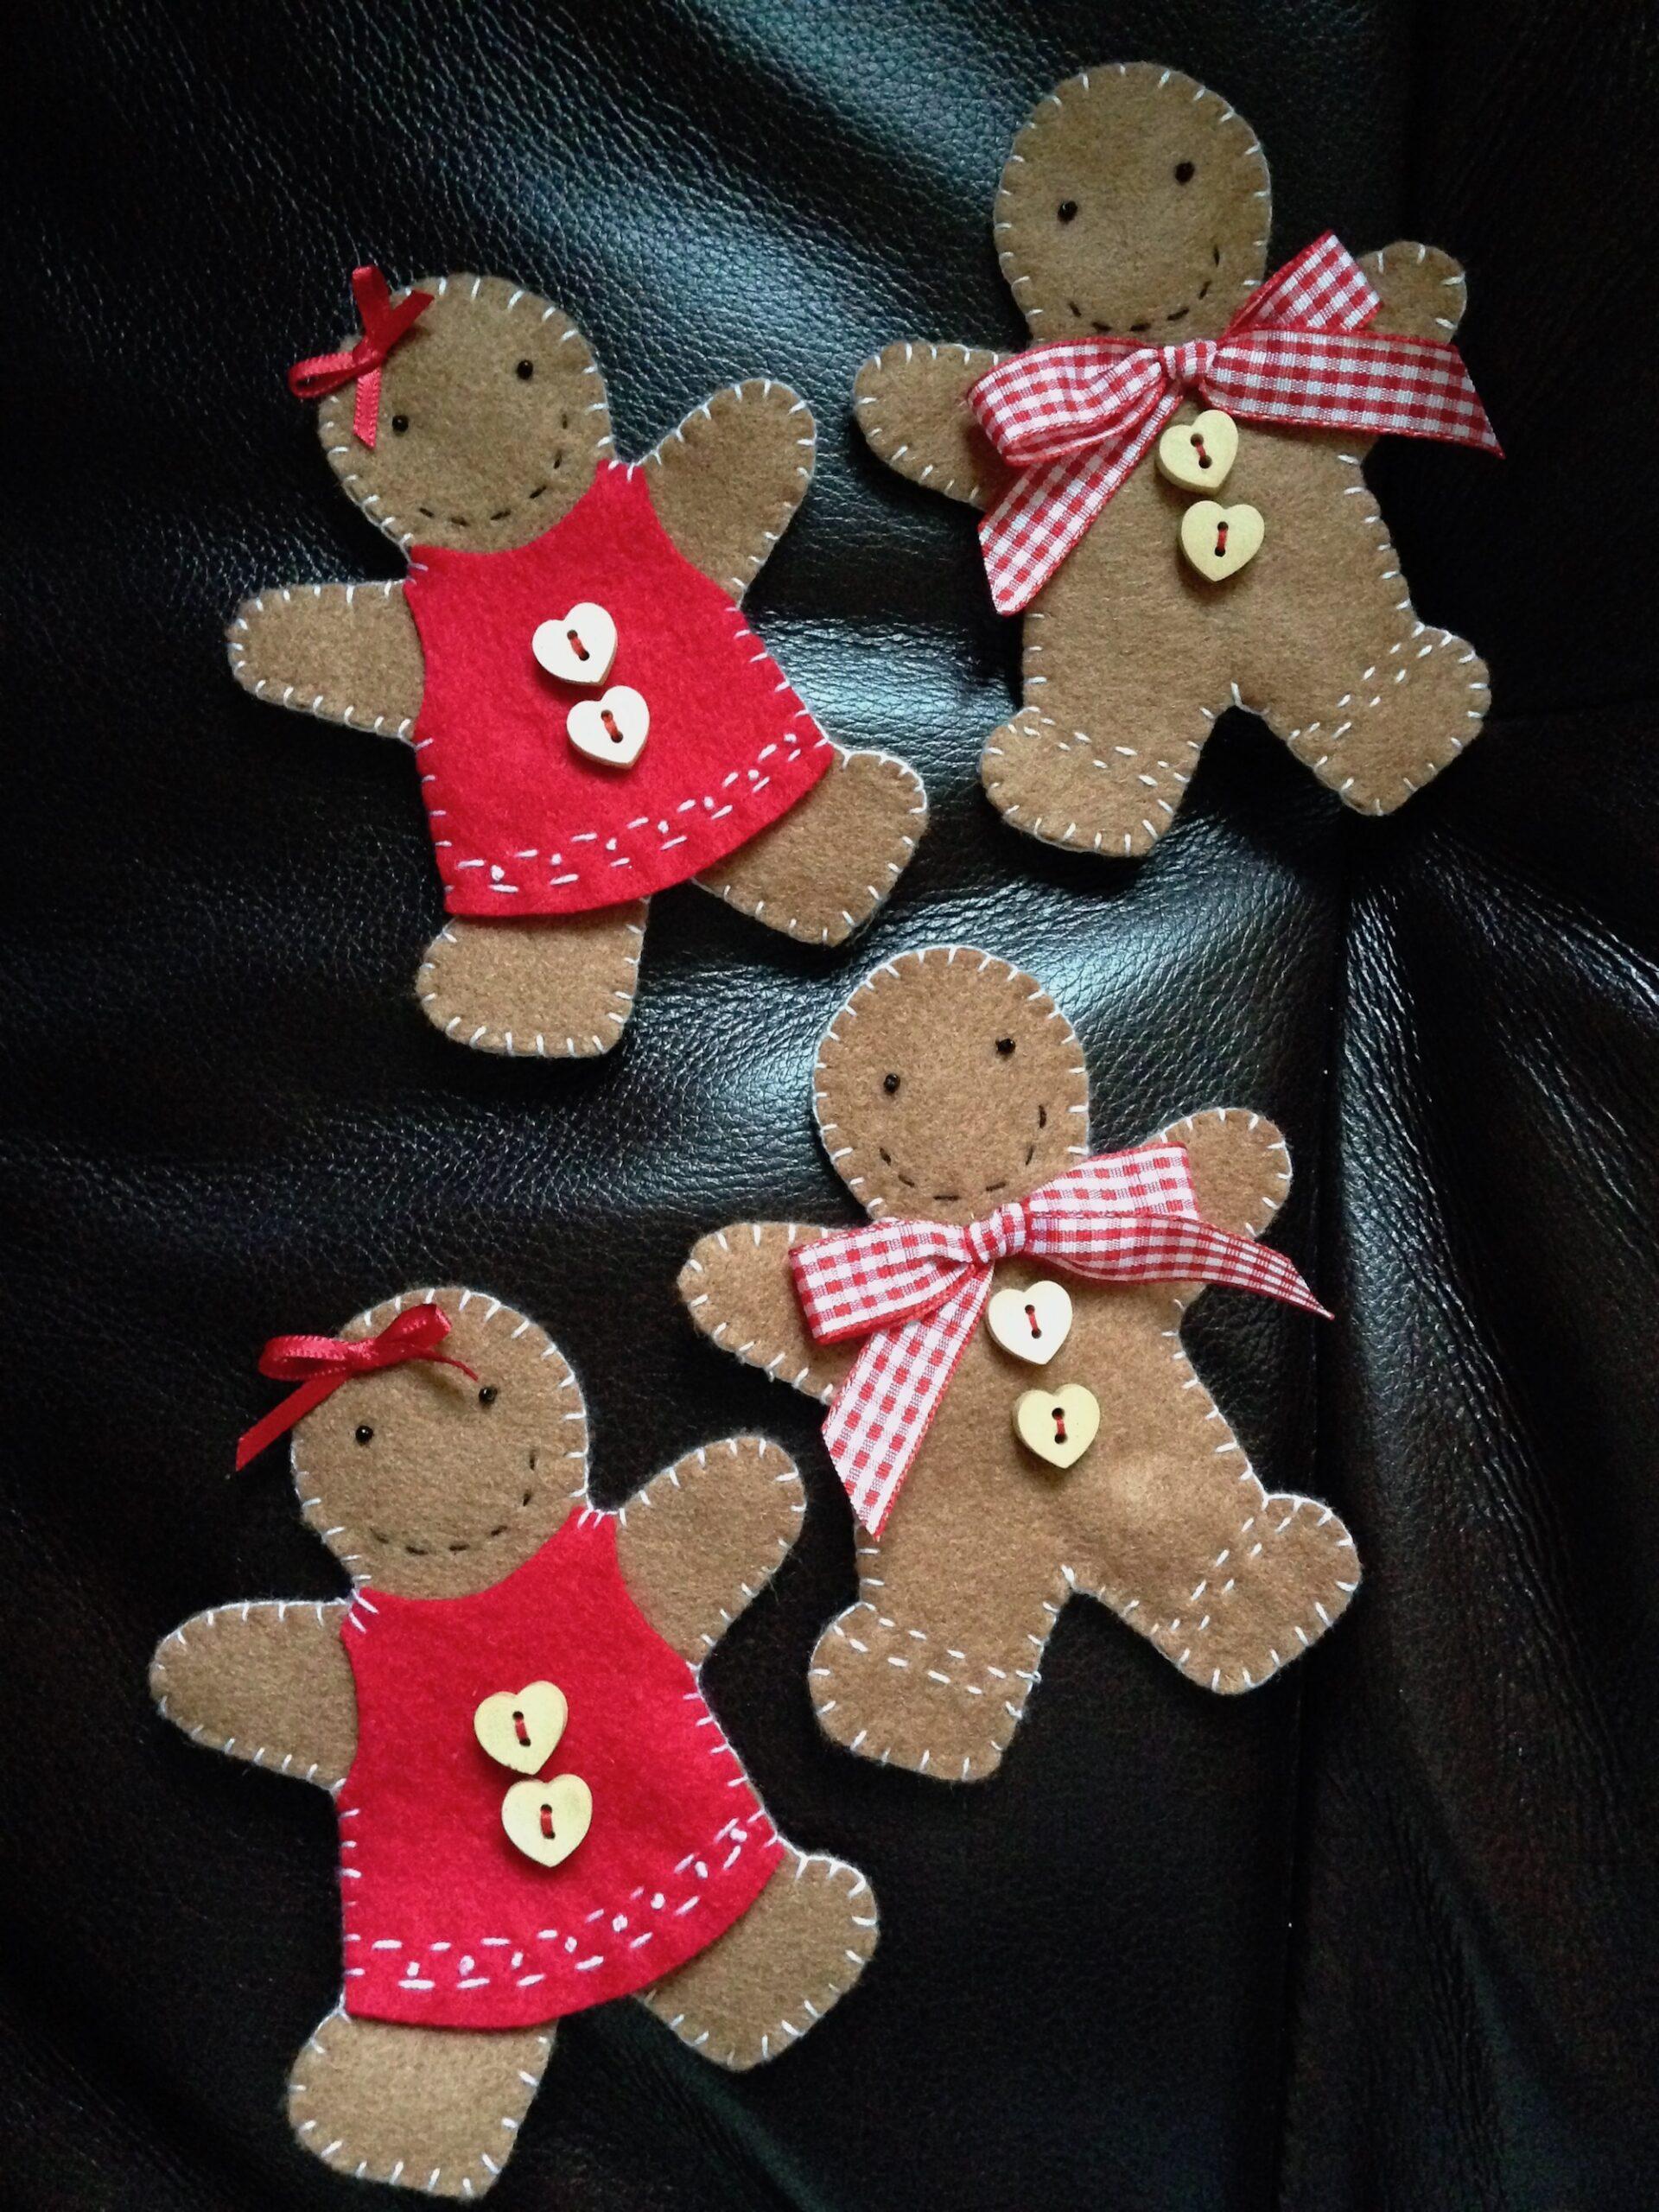 Gingerbread people.